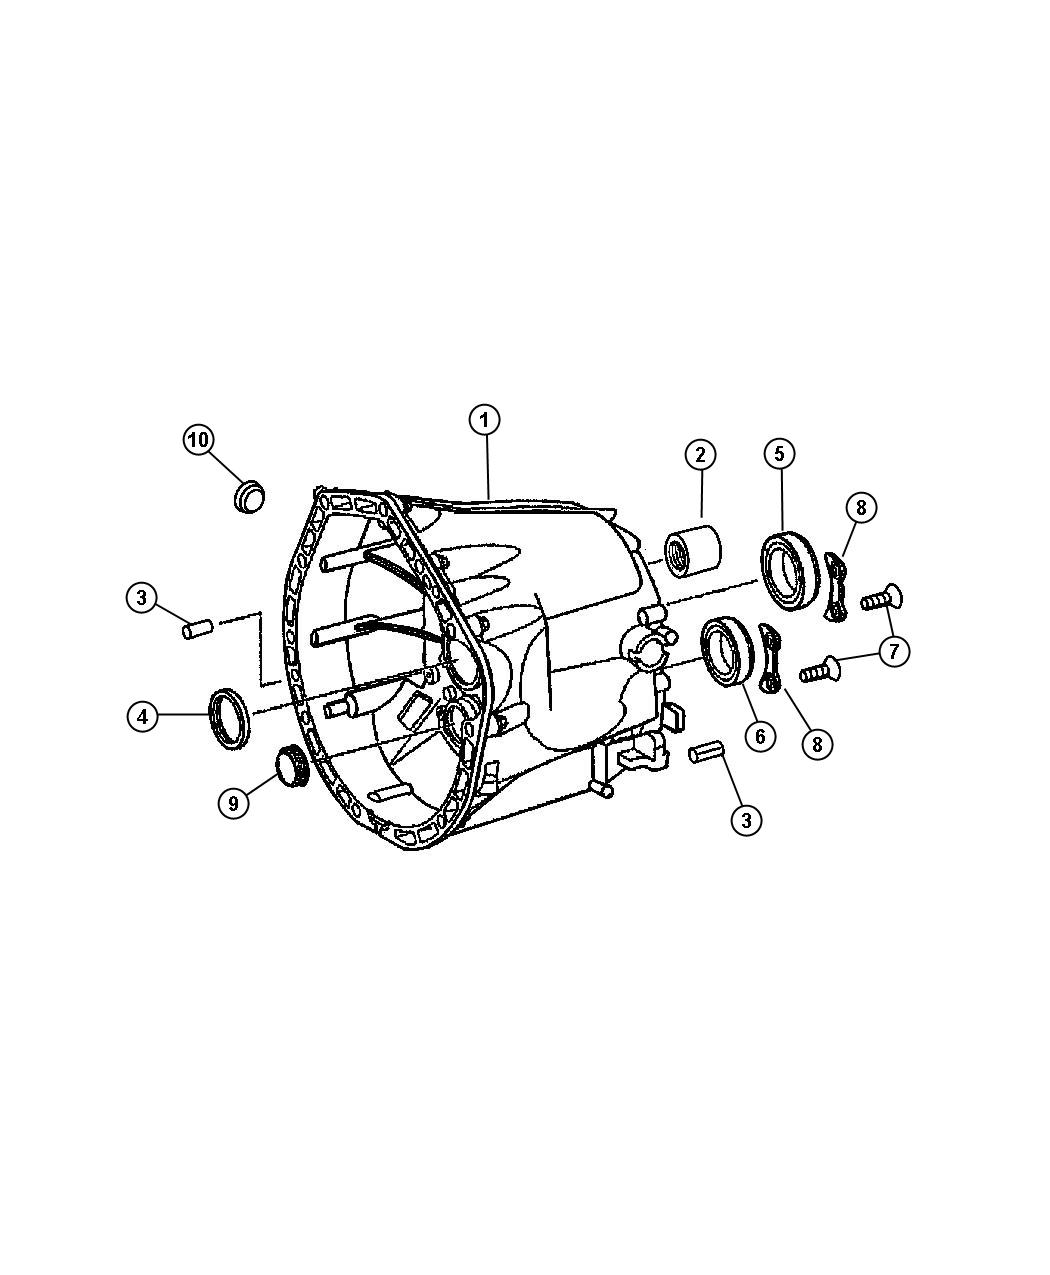 Chrysler Crossfire Case Transmission Clutch